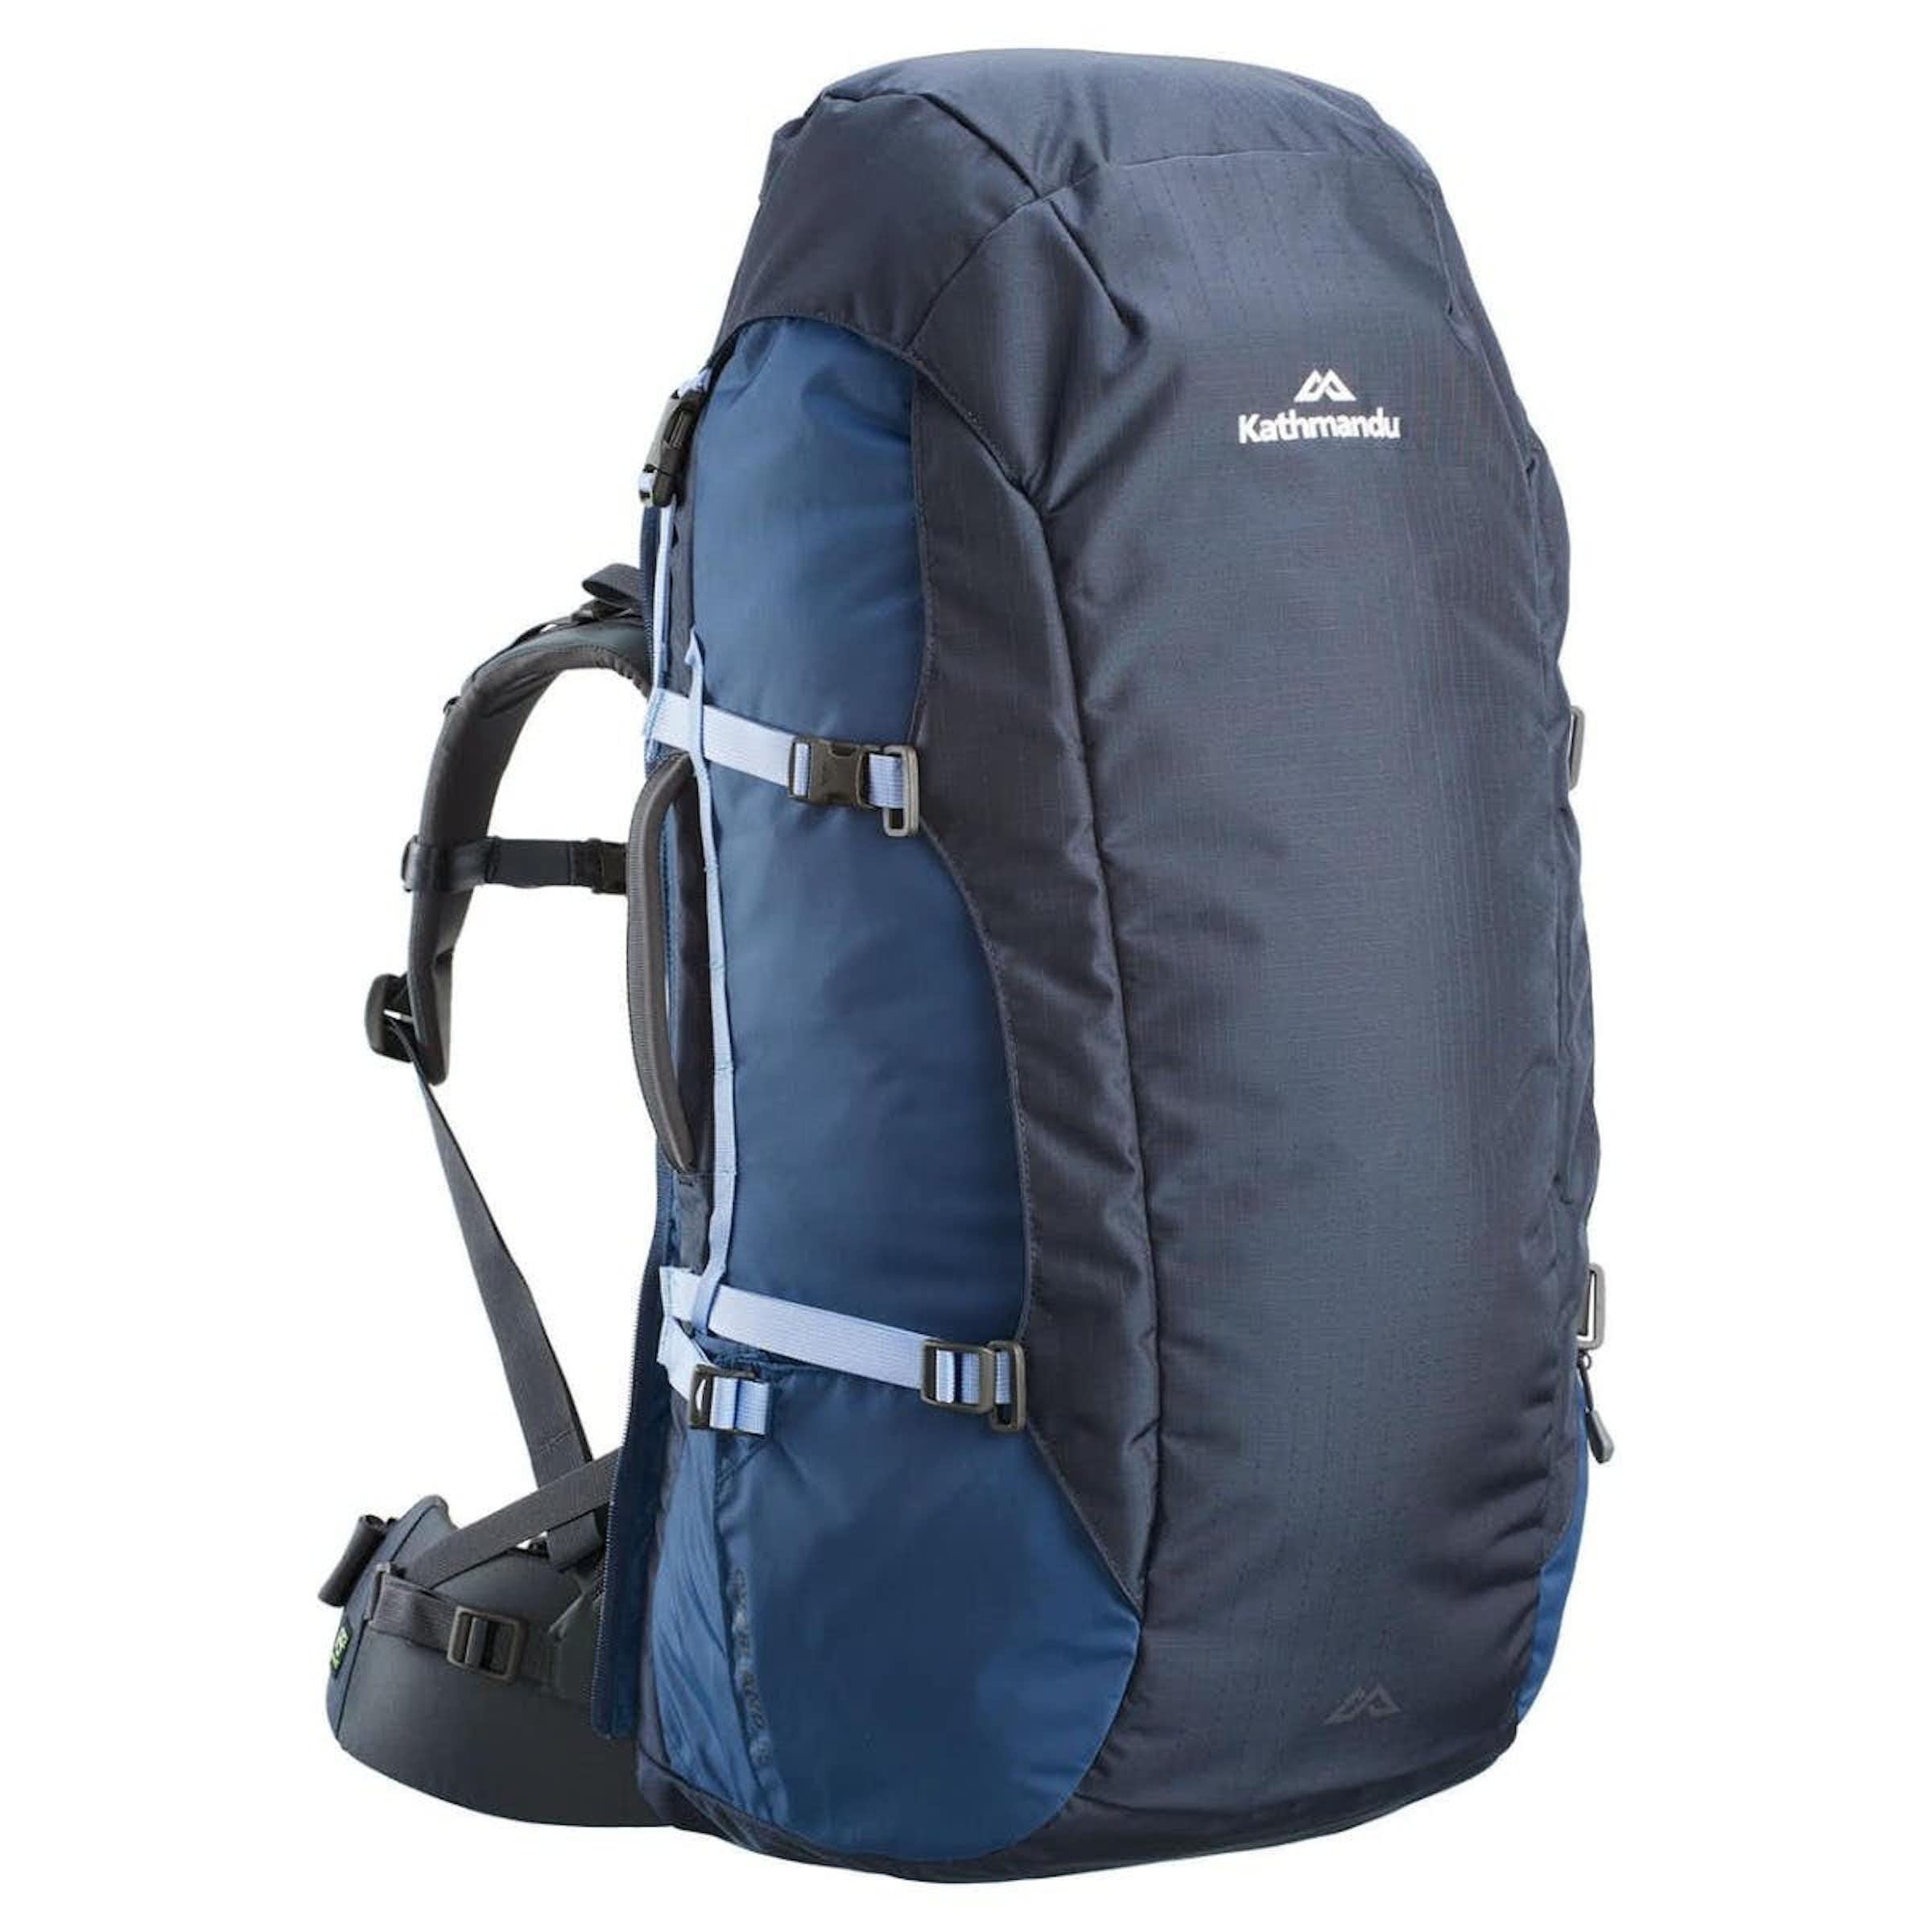 Packs Bags For Travel Or Adventure Kathmandu Uk